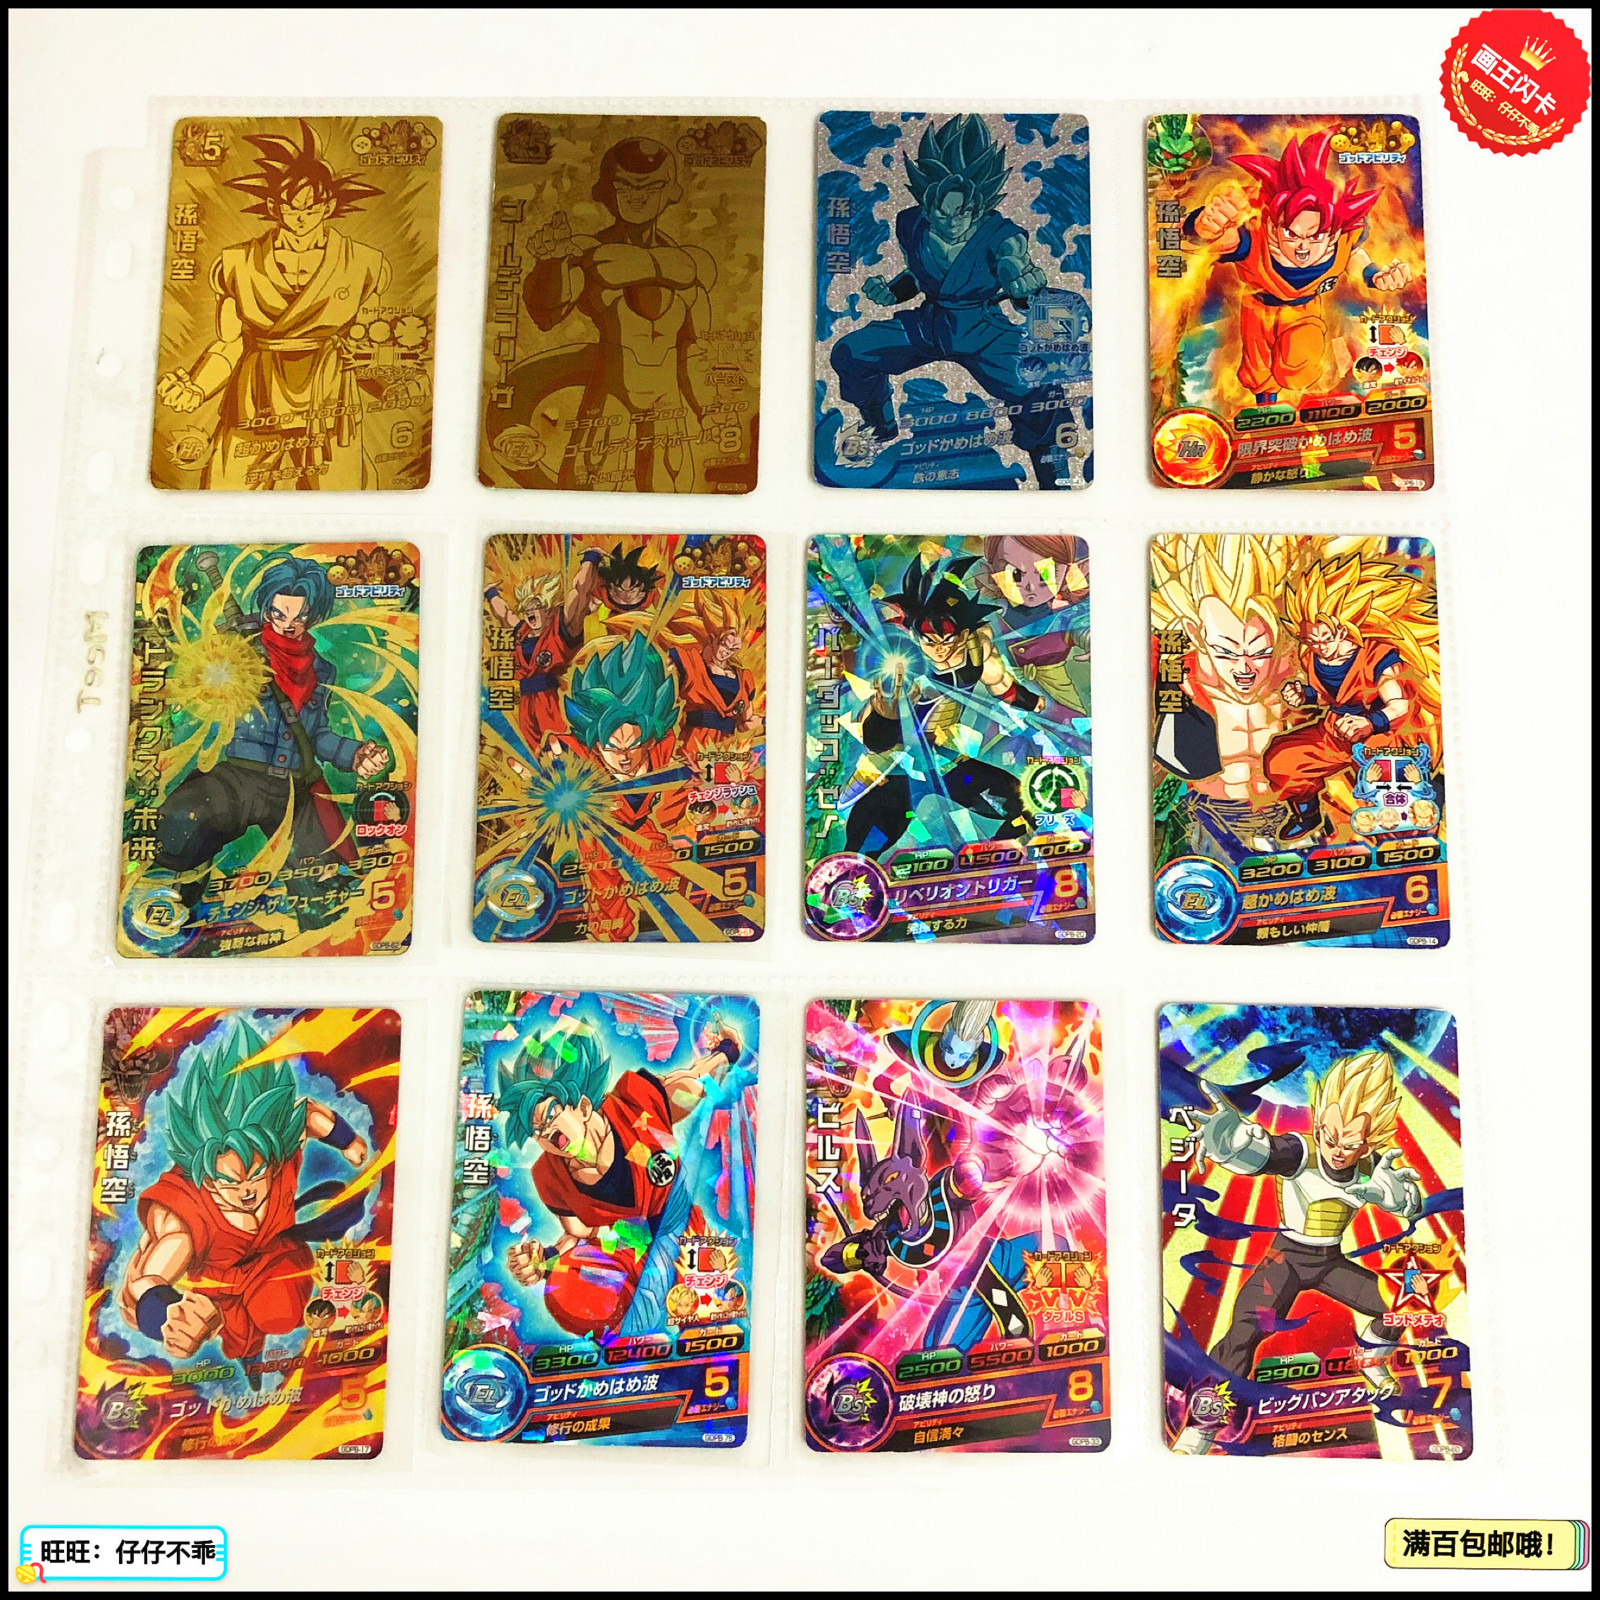 Japan Original Dragon Ball Hero Card GDPB Goku Toys Hobbies Collectibles Game Collection Anime Cards